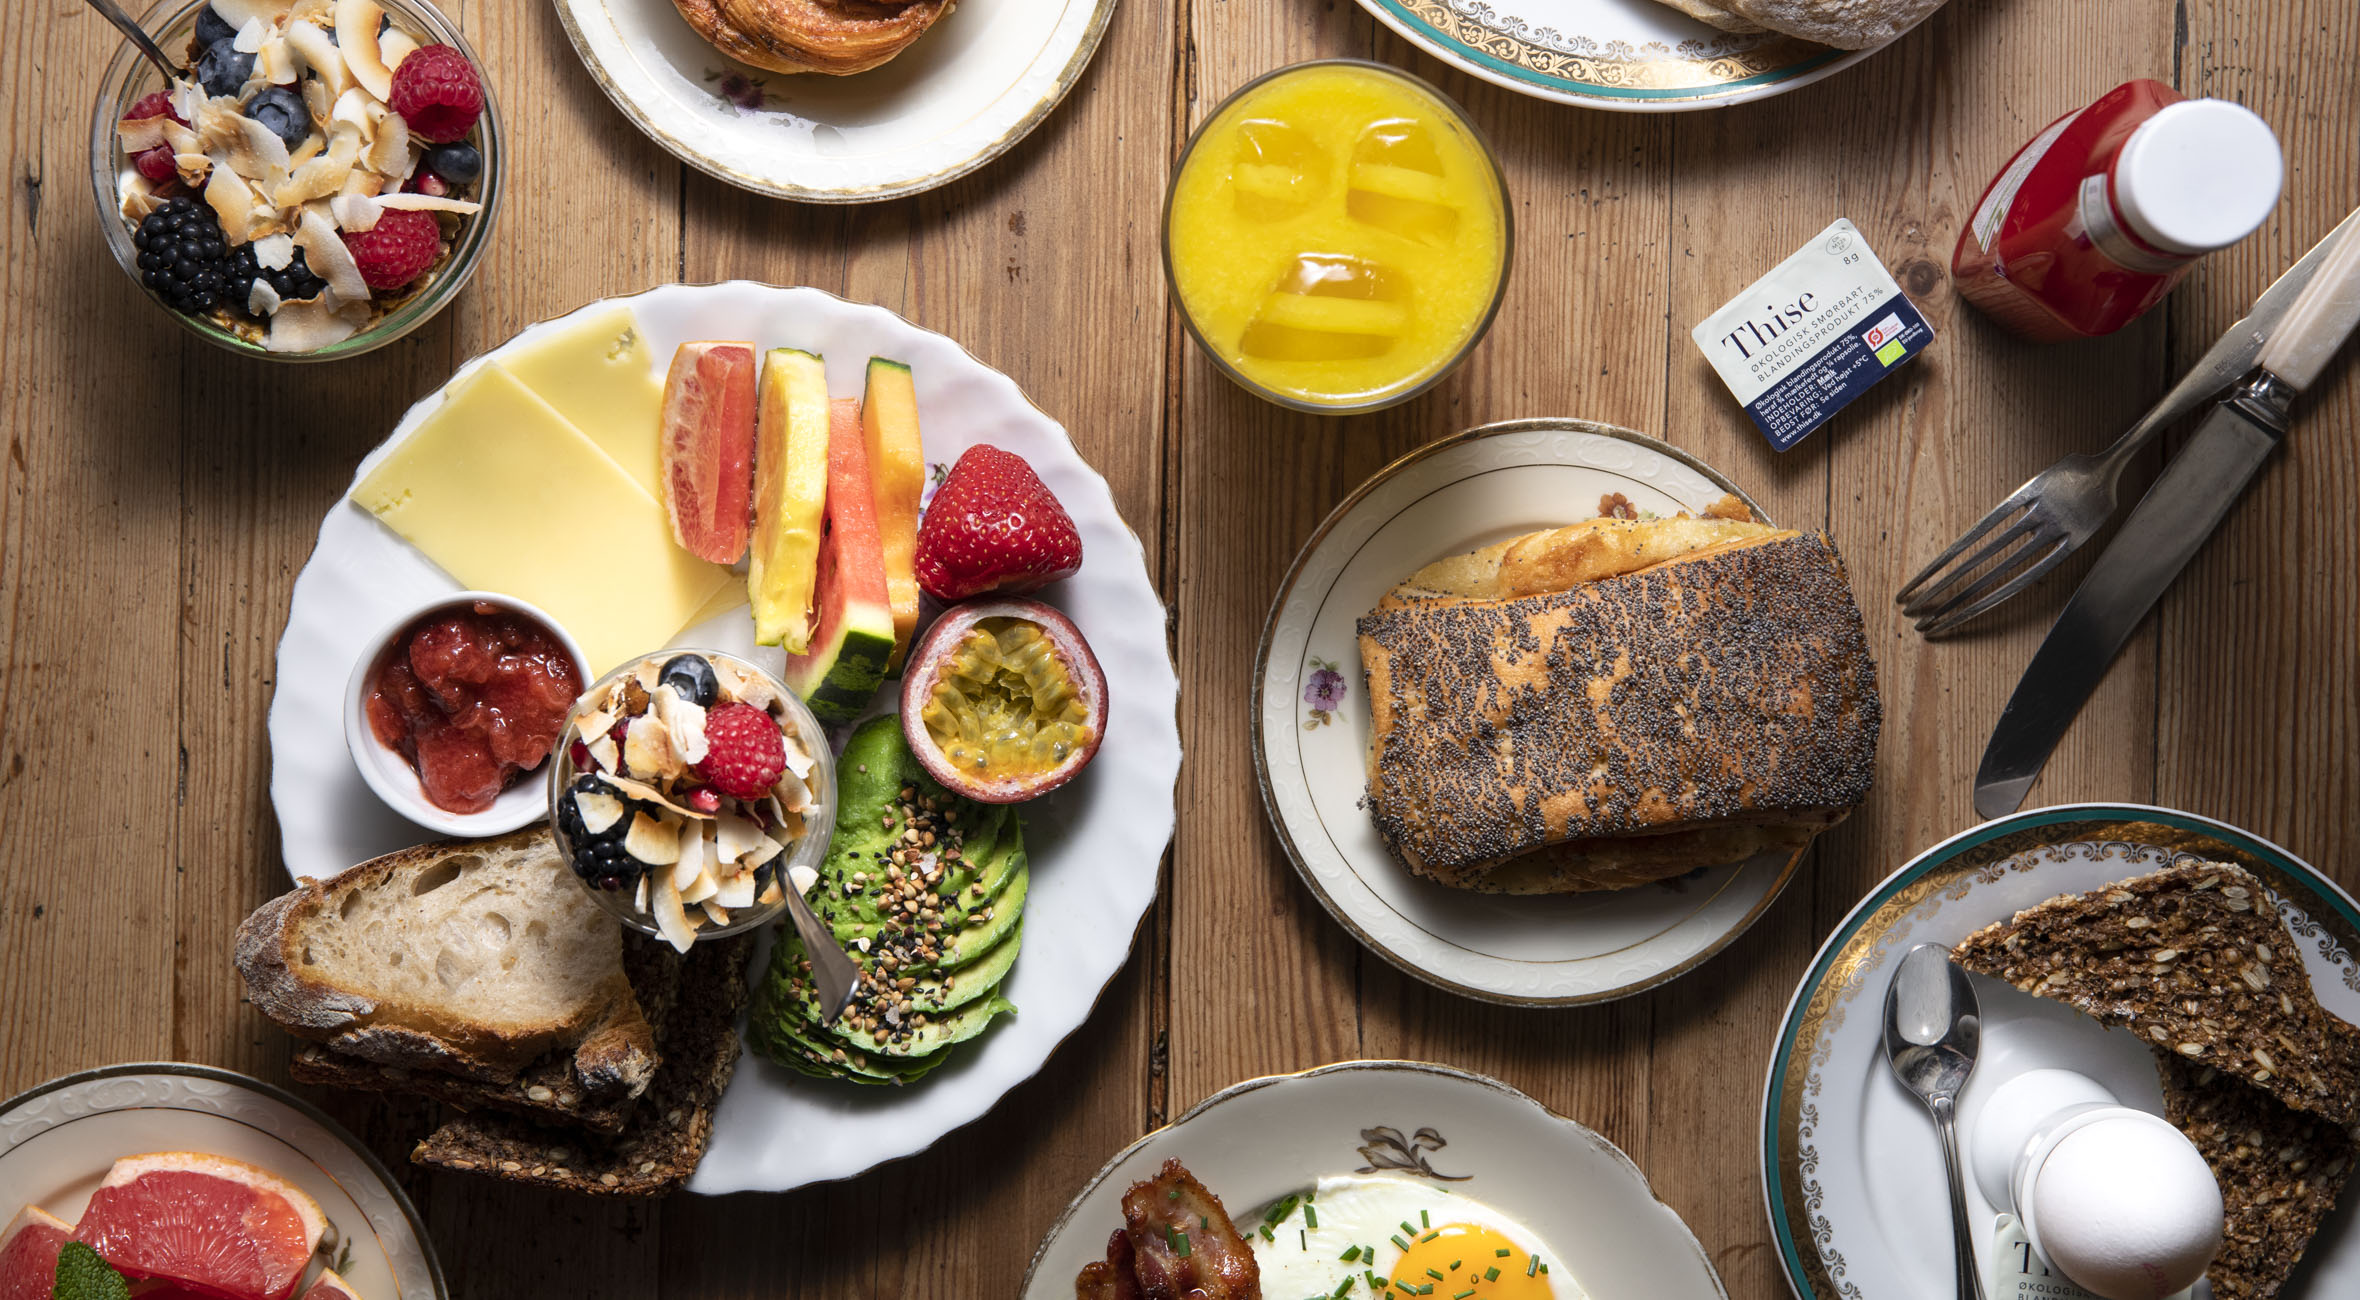 Frit valg til alt hos Kompa9 – Få alt fra pocheret æg med avocado til røræg med bacon, yoghurt, kartoffel- & avocadomadder, sommersalater og vegansk banankage